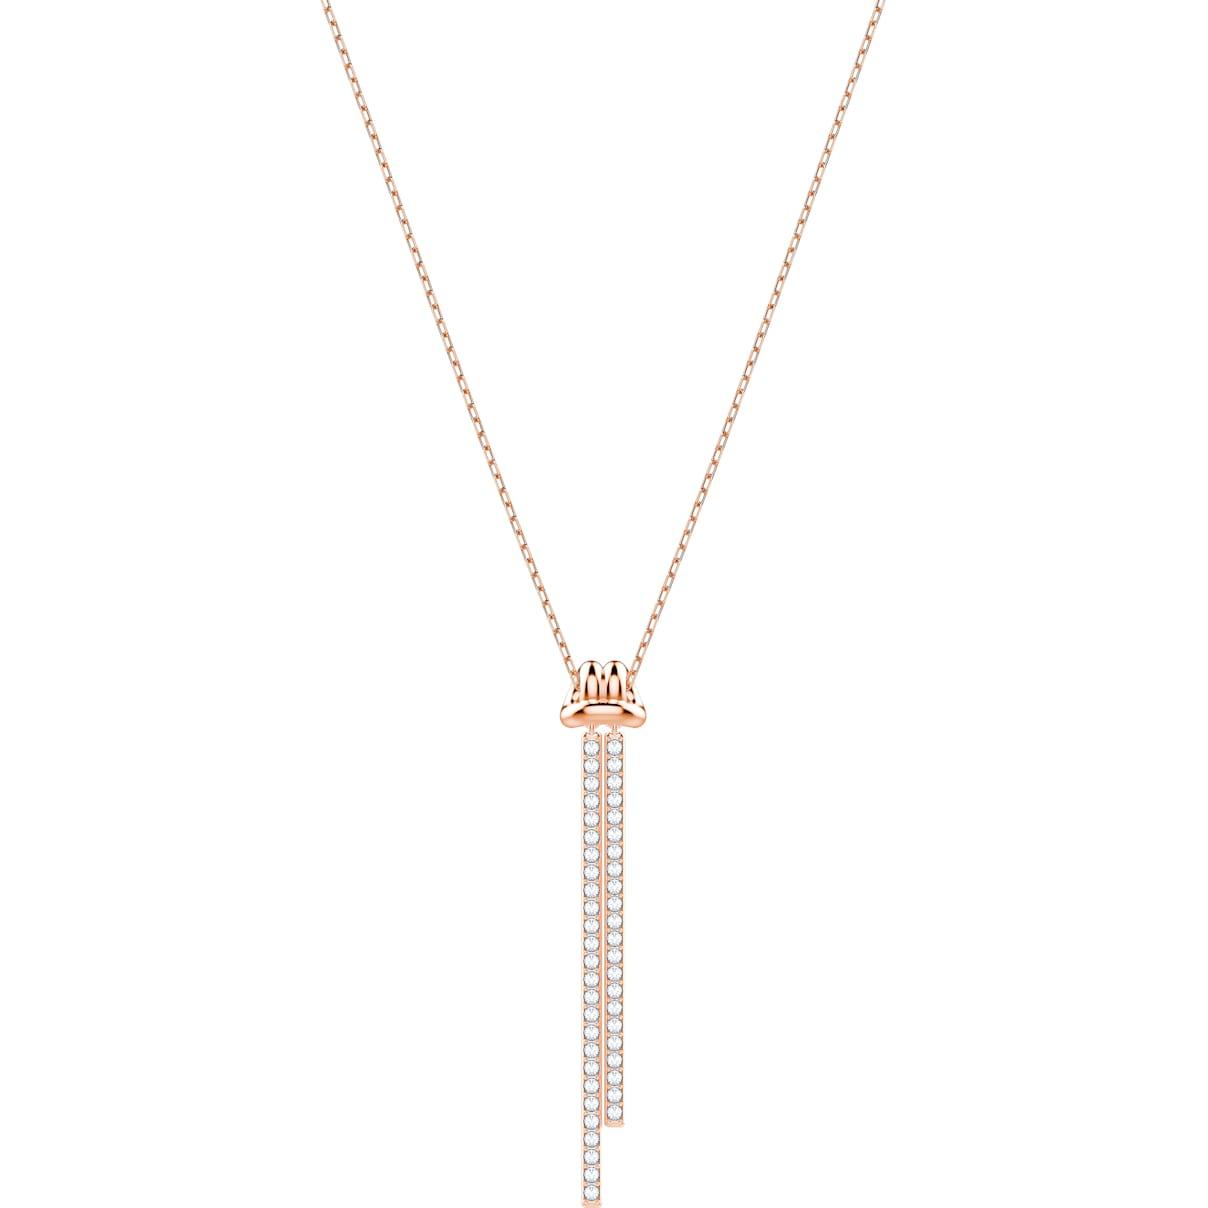 Swarovski Lifelong Y Pendant, White, Rose-gold tone plated